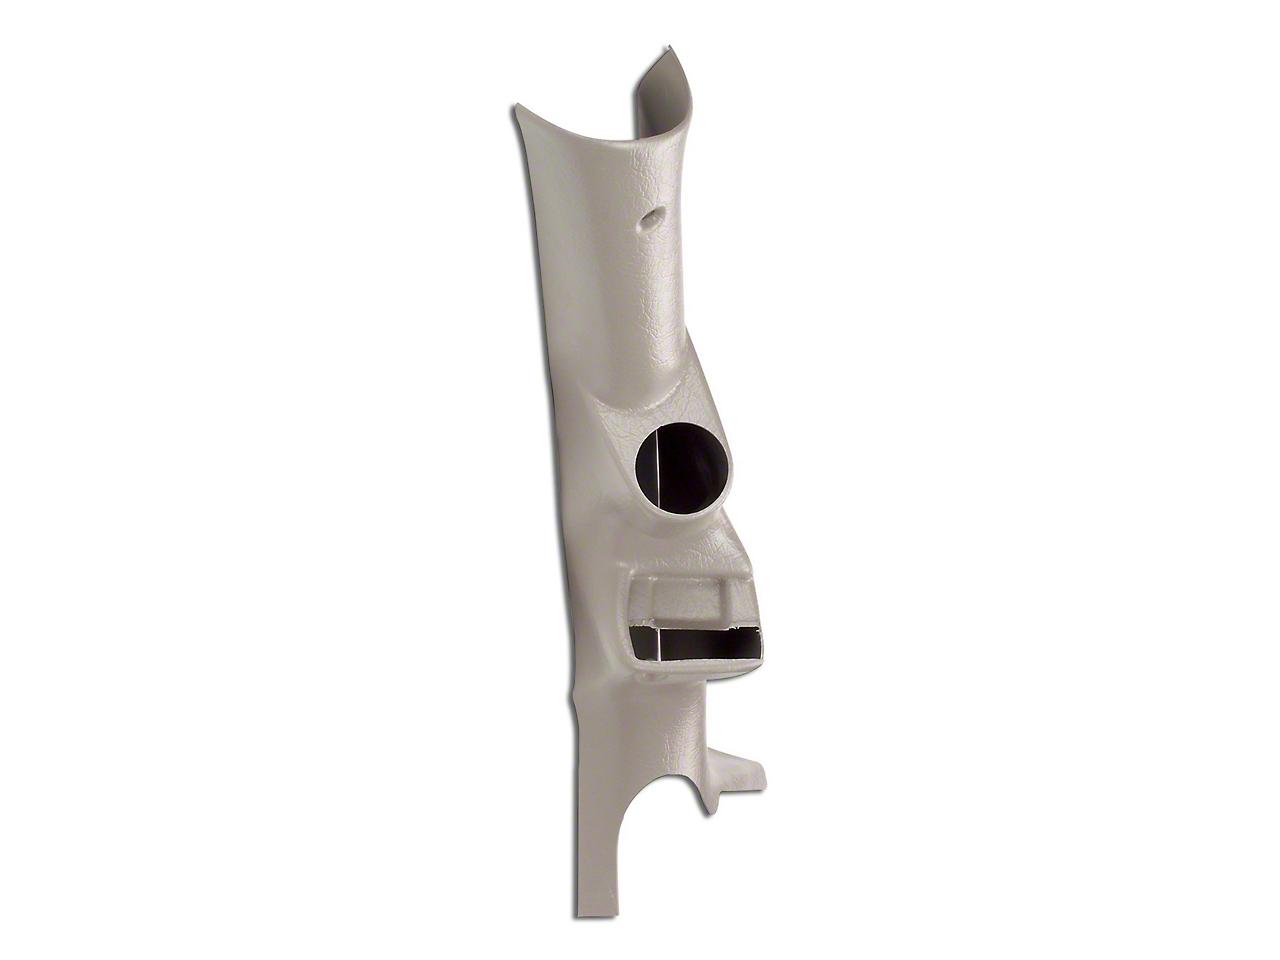 Auto Meter A-Pillar Pod for Edge Attitude Tuner & 2-1/16 in. Gauge (03-09 RAM 1500)